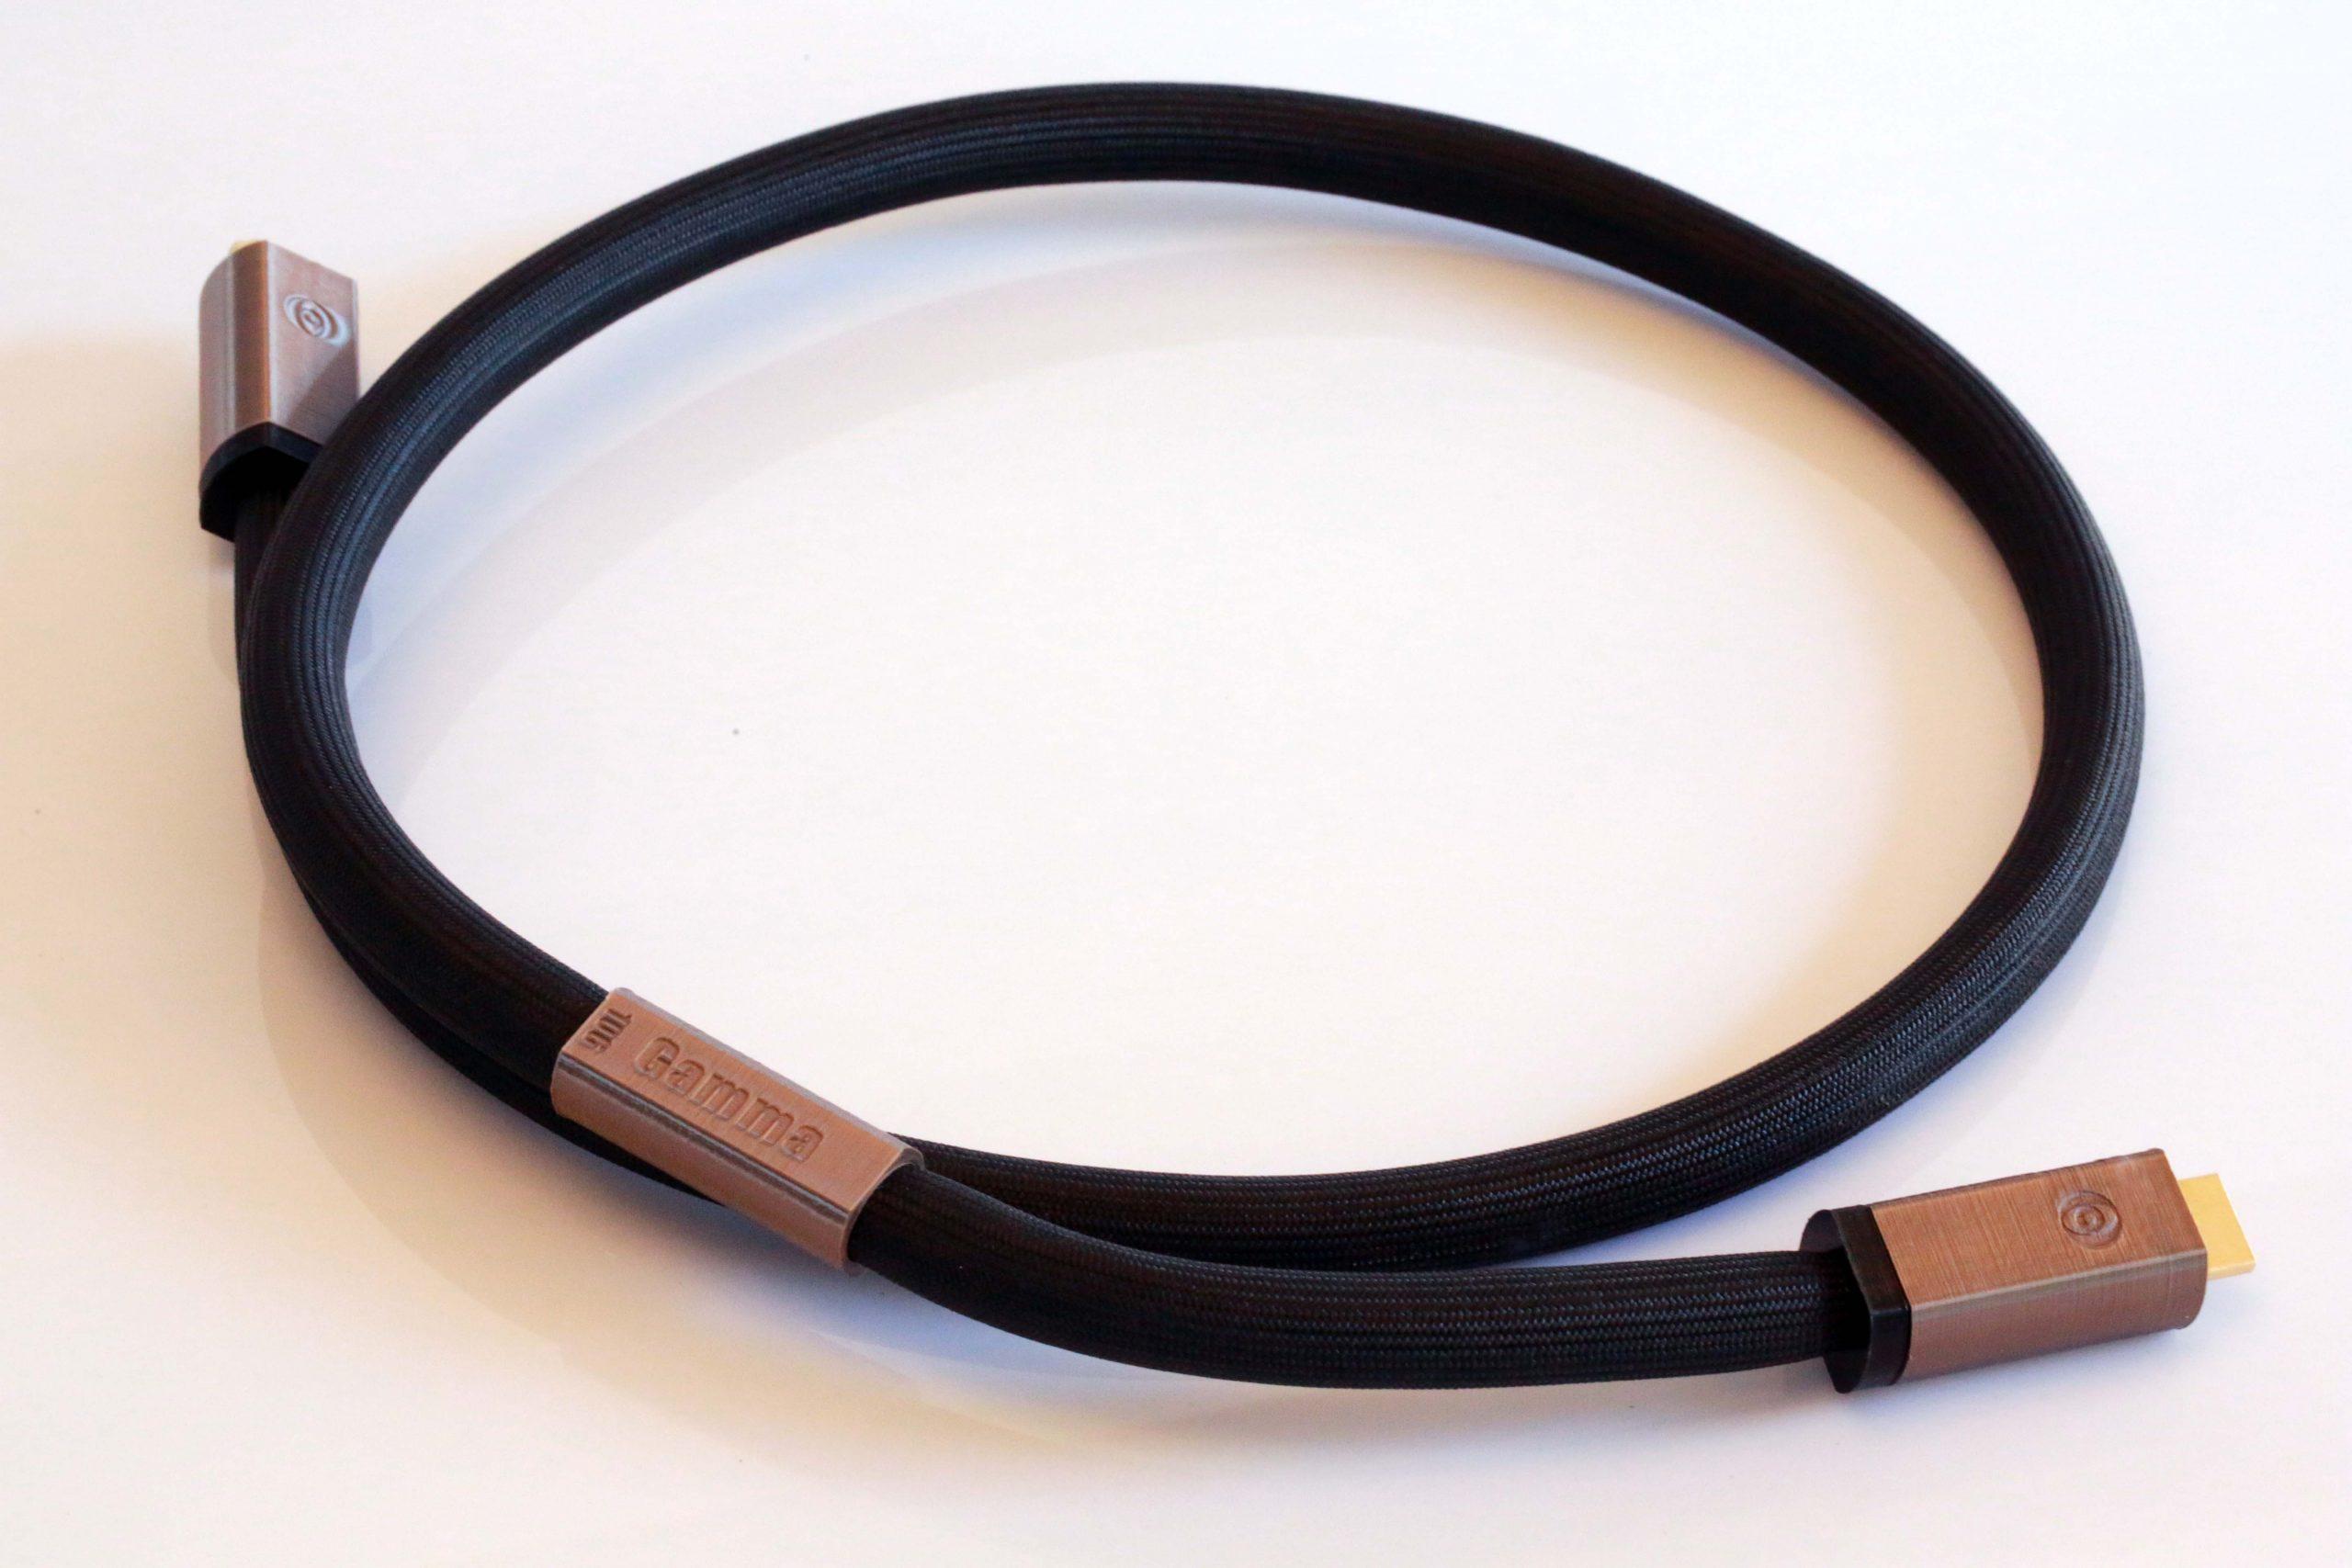 Gamma Numérique HDMI Digital Odeion Cables